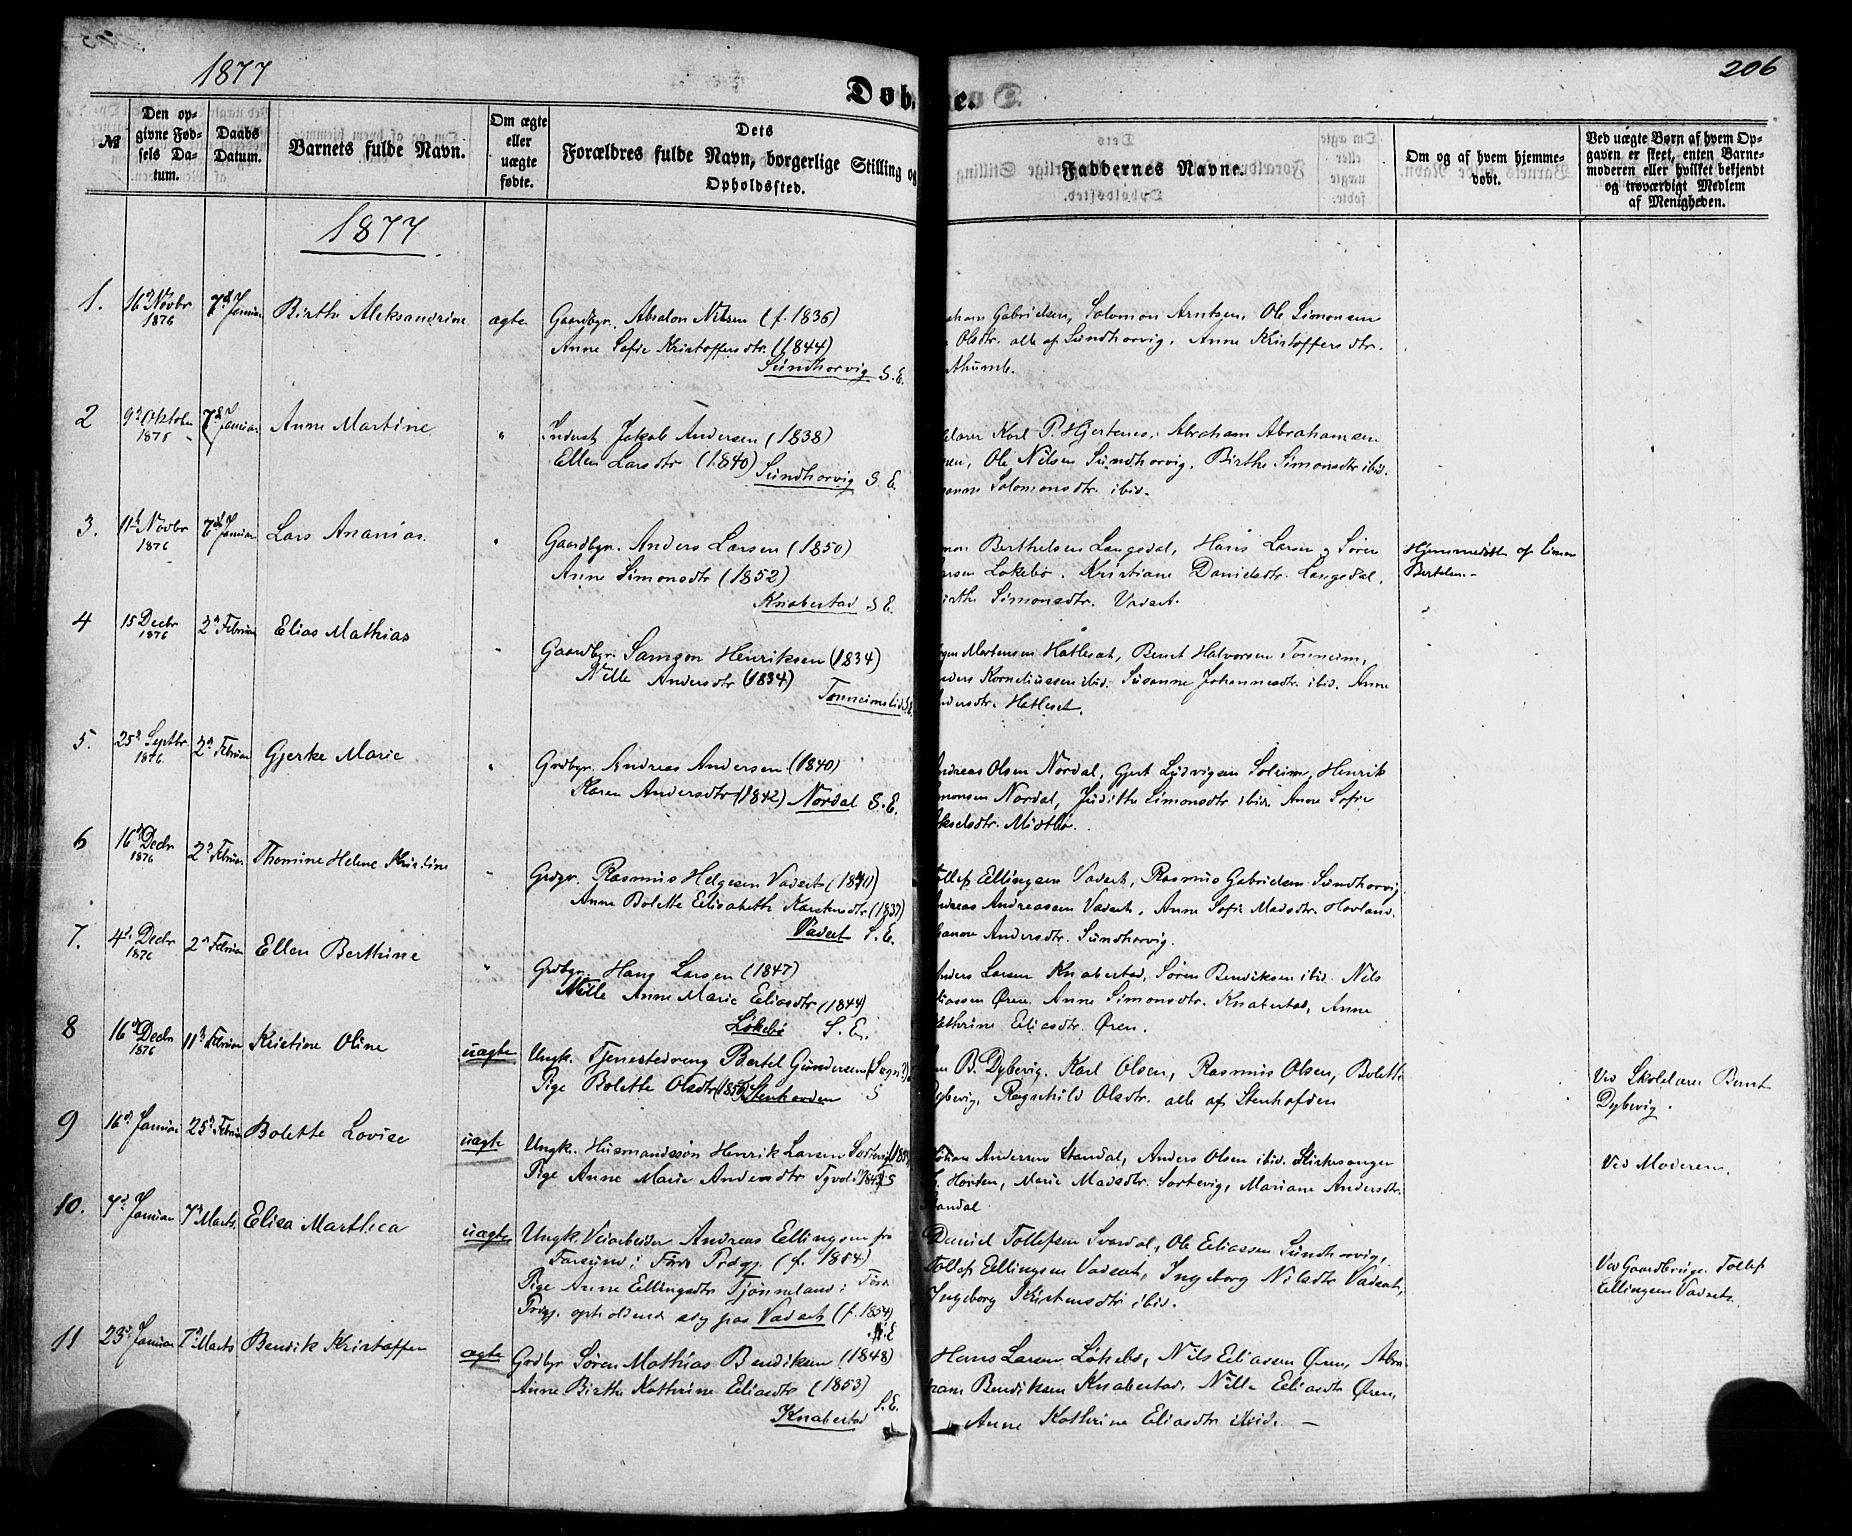 SAB, Kinn sokneprestembete, H/Haa/Haaa/L0006: Ministerialbok nr. A 6, 1857-1885, s. 206